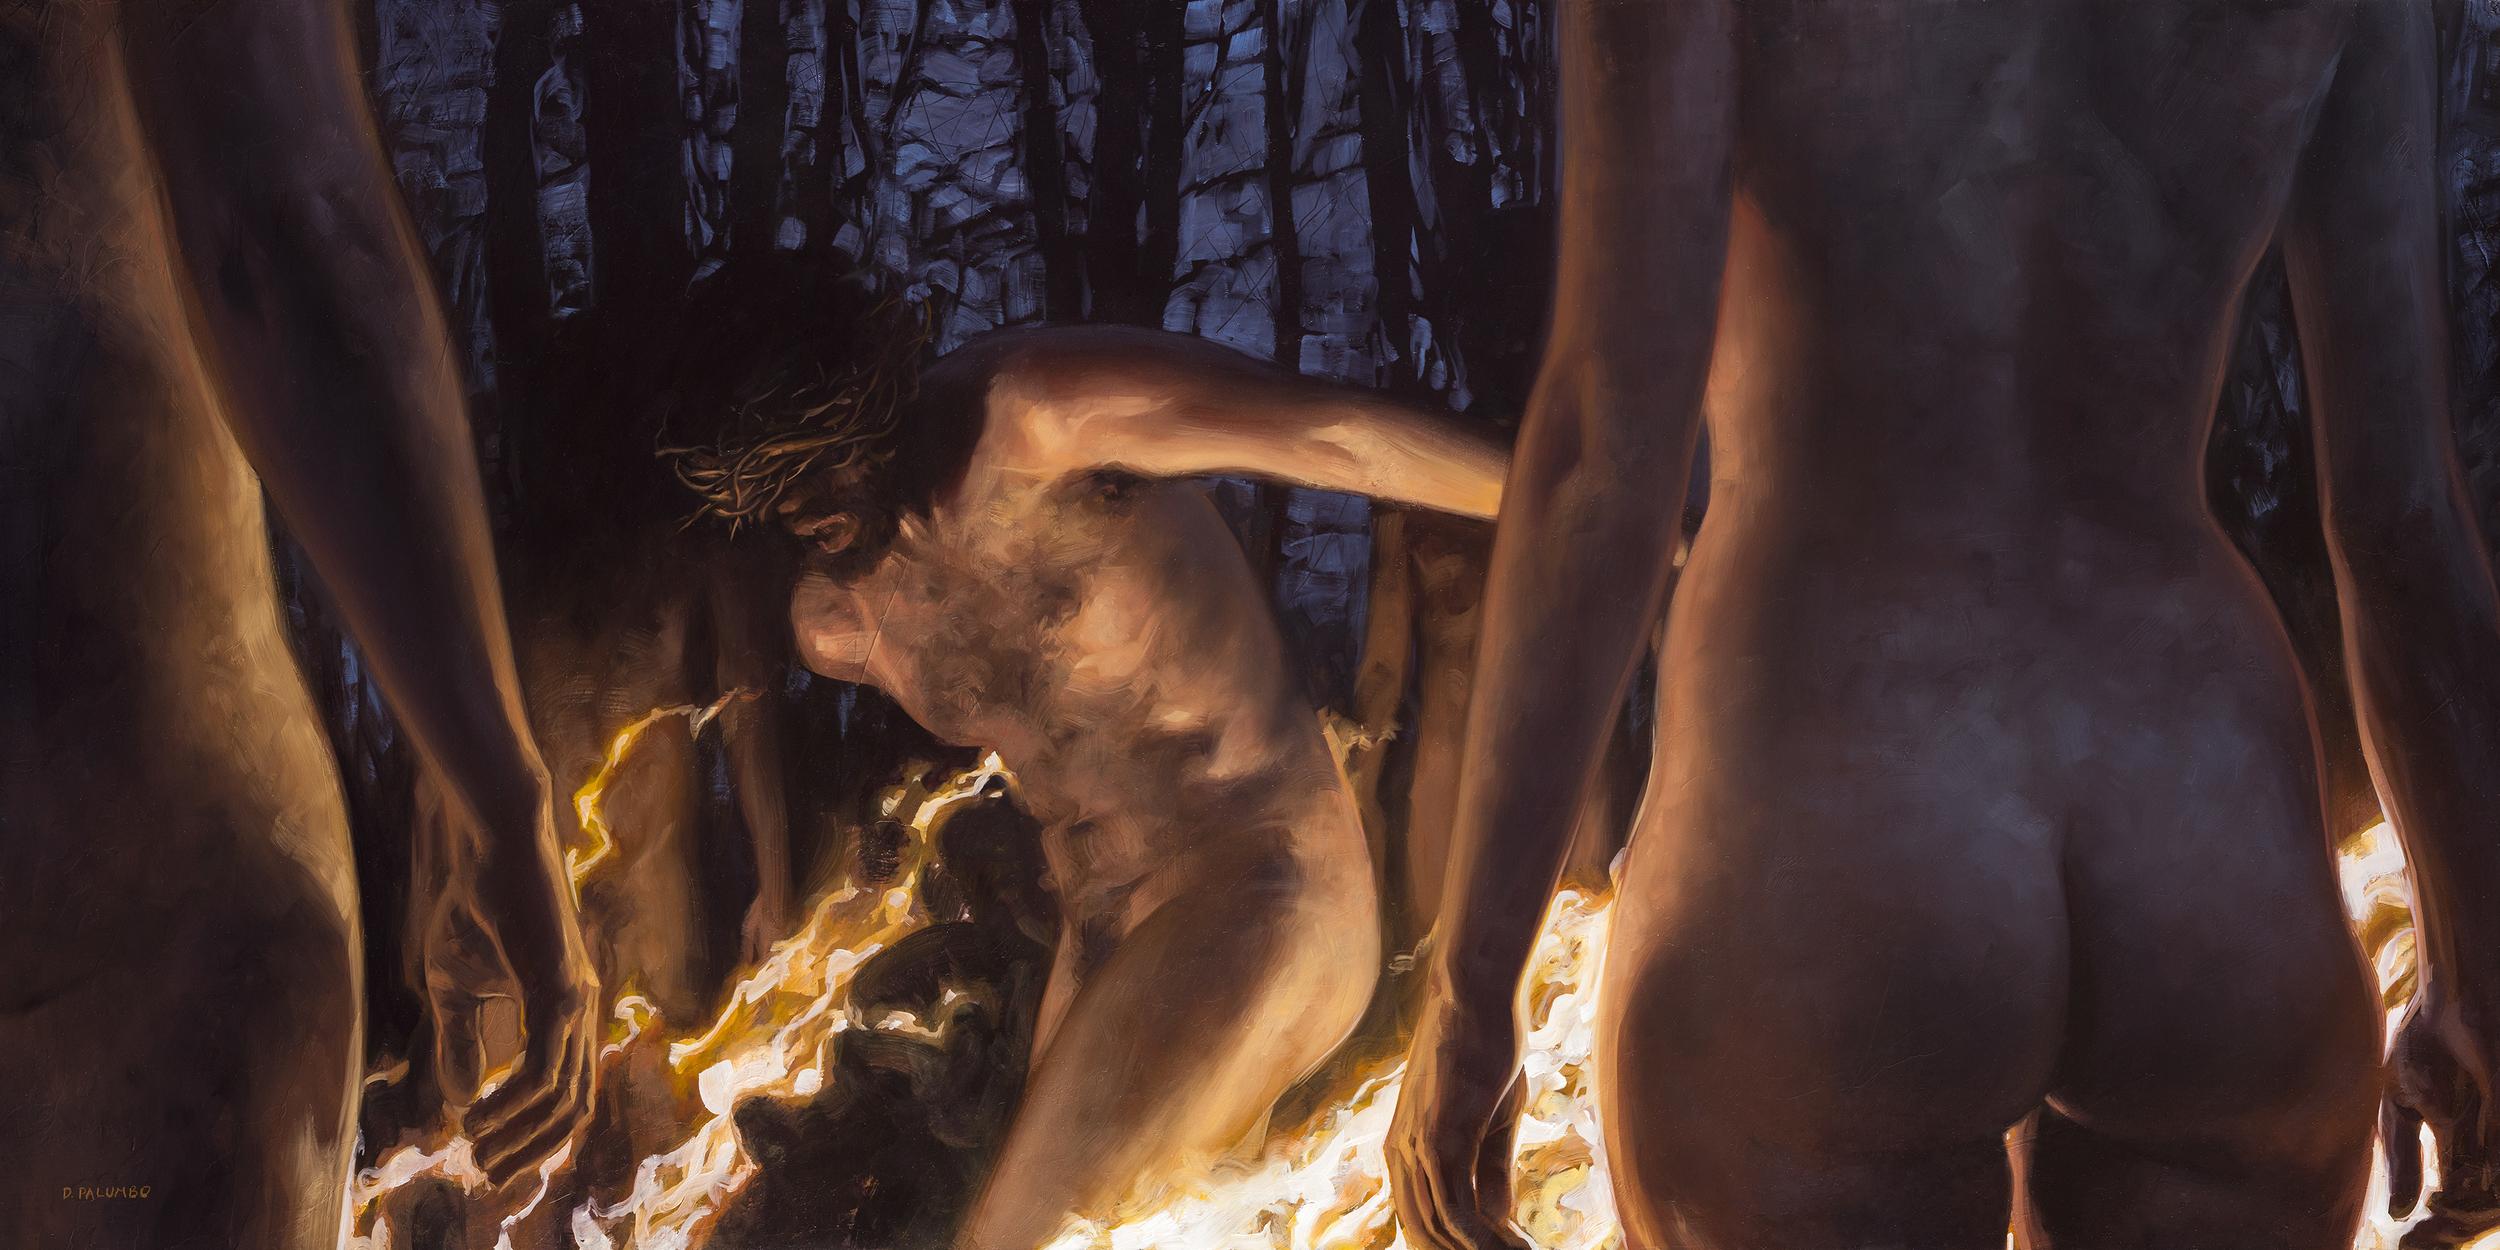 The Circle of Flame Artwork by David Palumbo